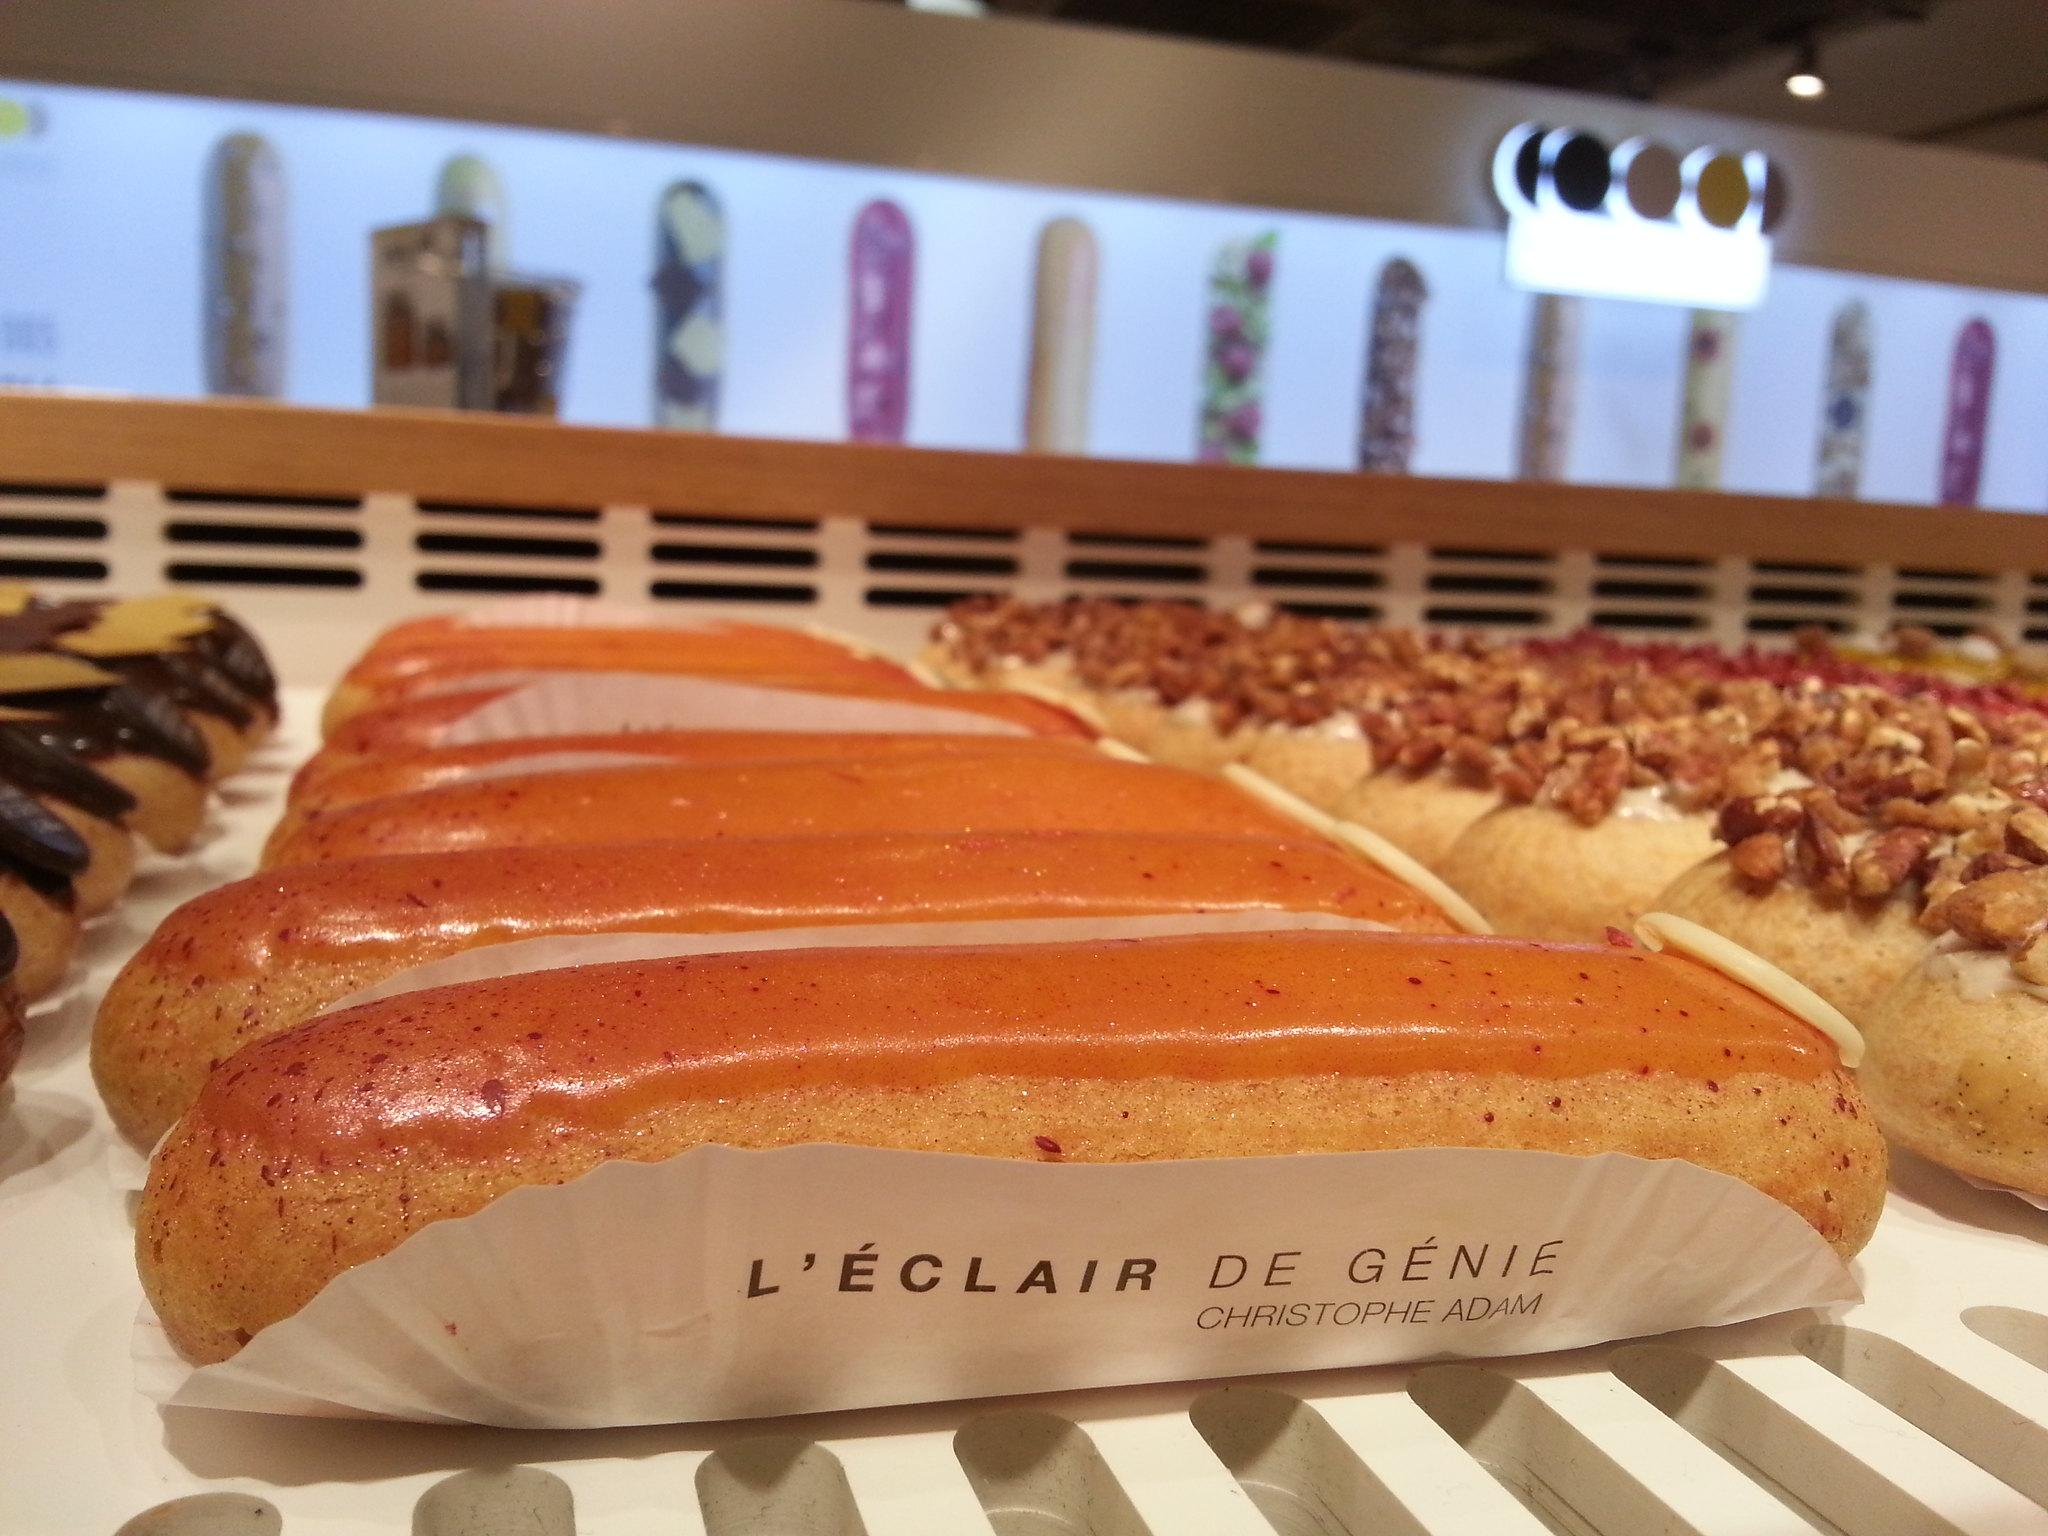 Galaries Lafayette Gourmet Eclair de Genie